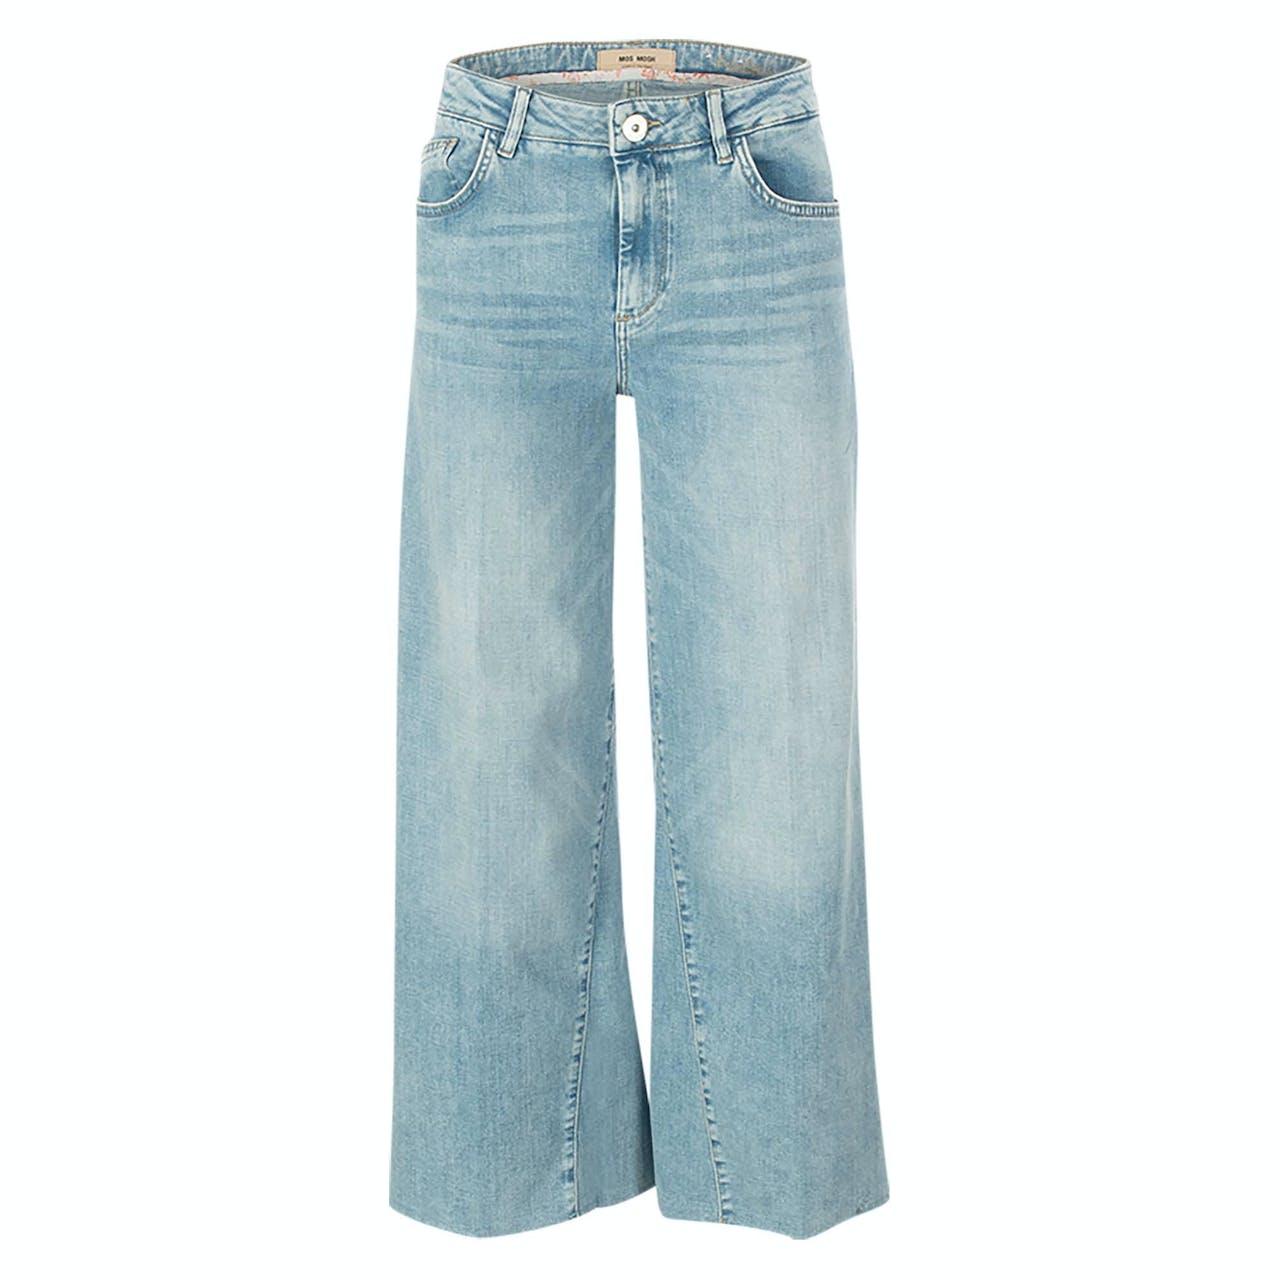 Jeans - Loose Fit - Reem Swift